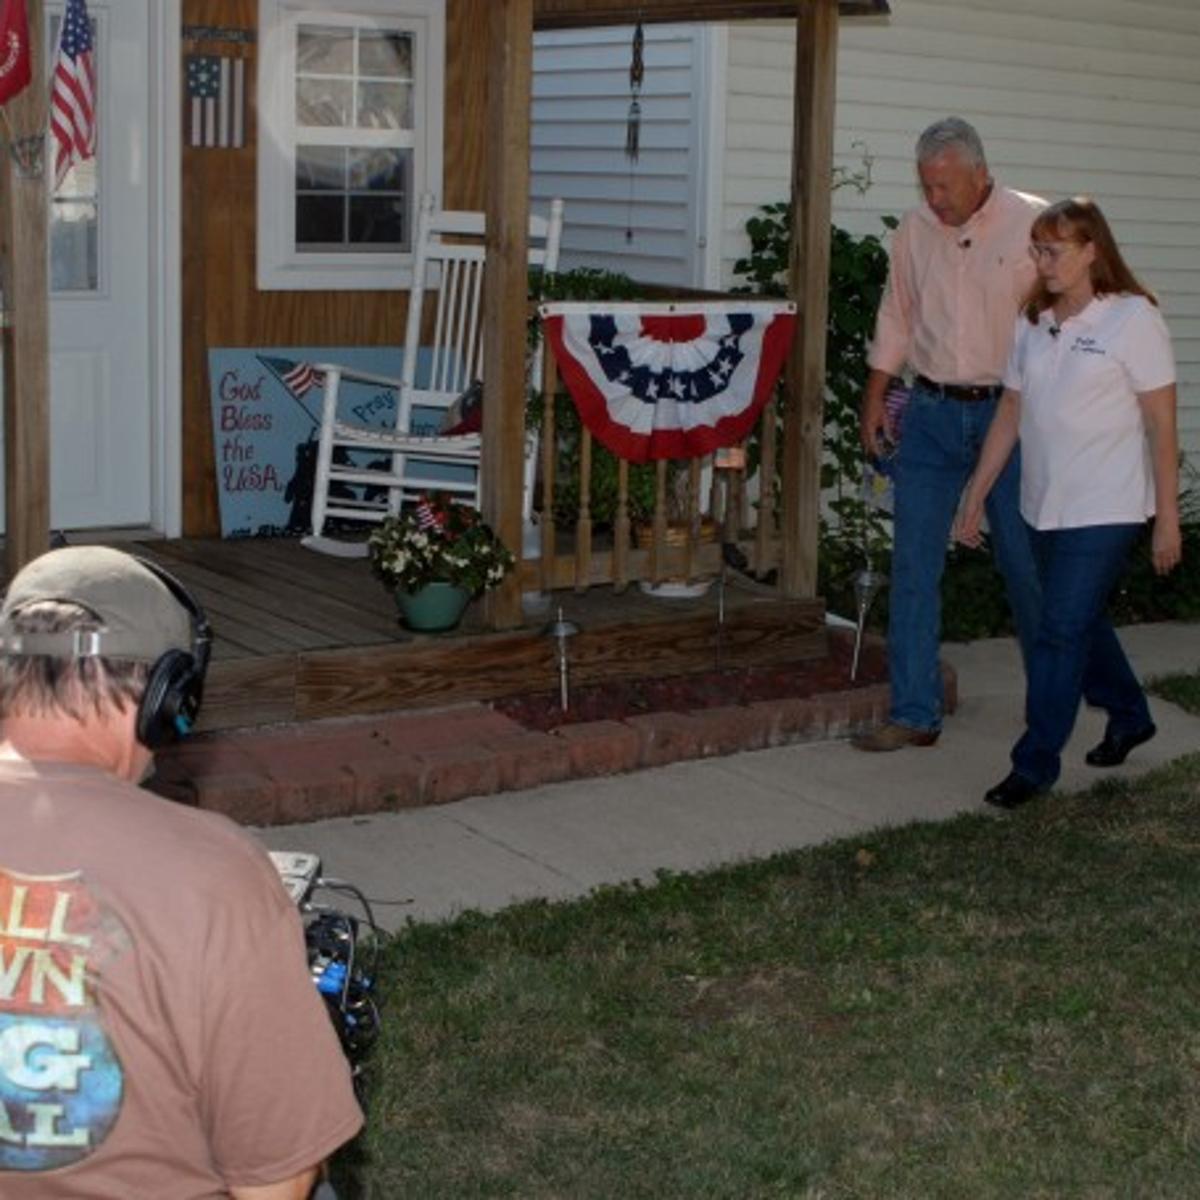 Shelbyville woman's patriotic endeavor lands her on new program for